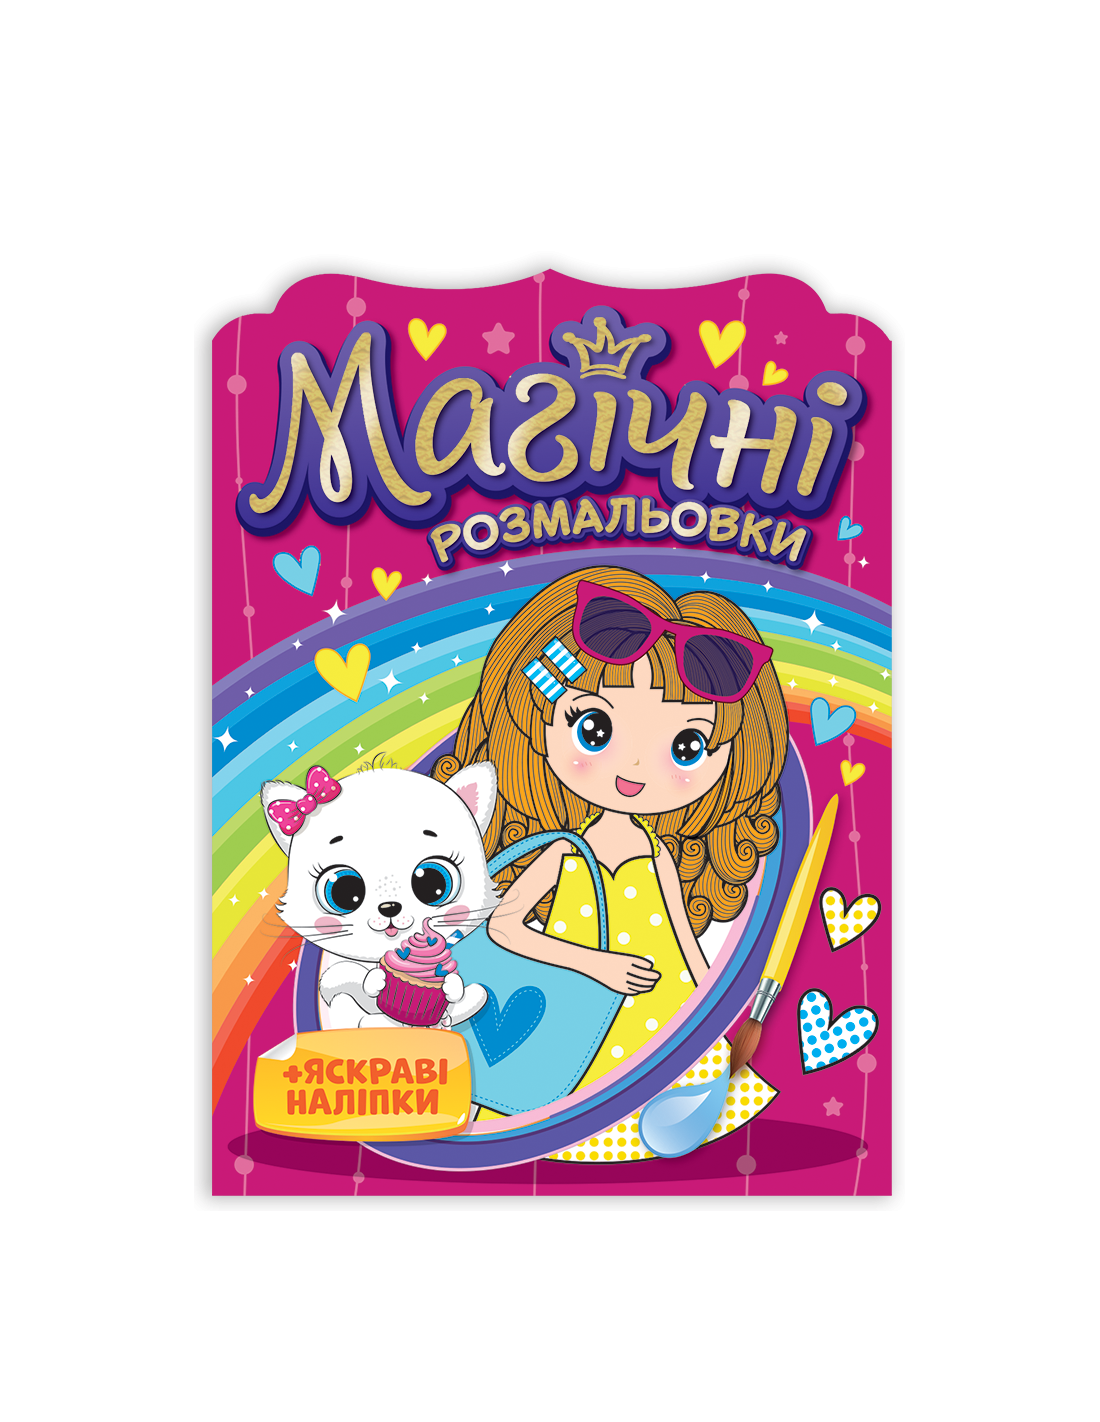 https://varyatko.com/sites/default/files/revslider/image/magichni-rozmalovki-divchatka.jpg